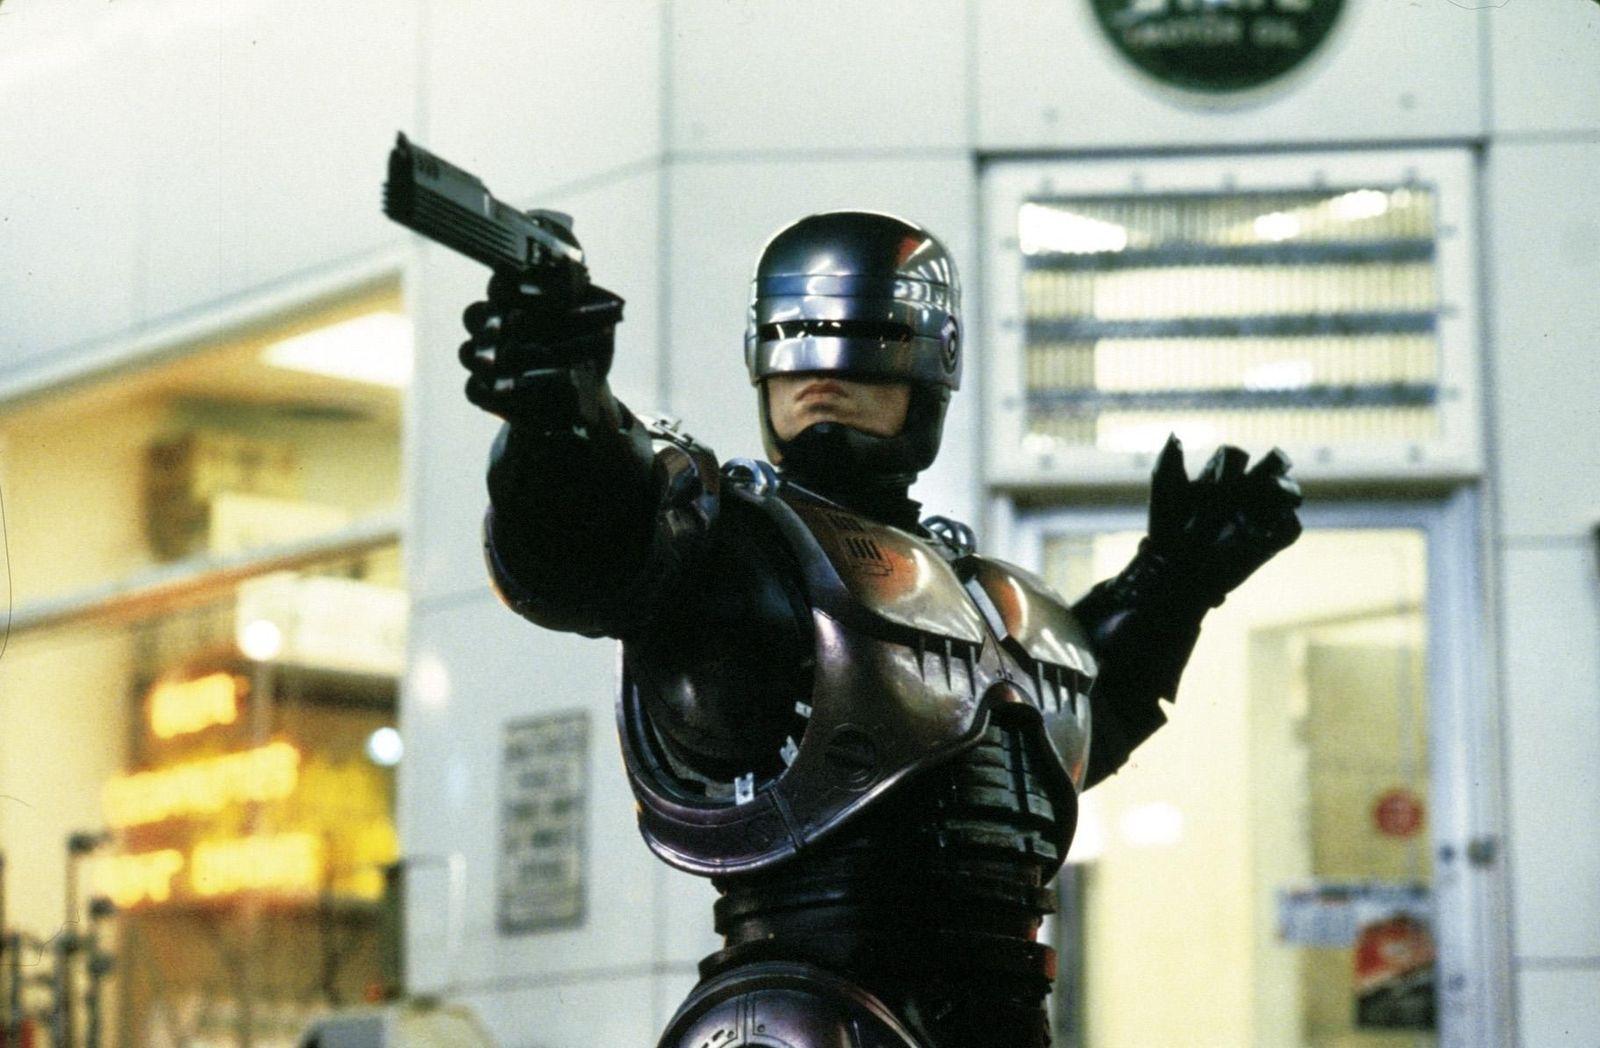 Terminator & Co. / Robocop